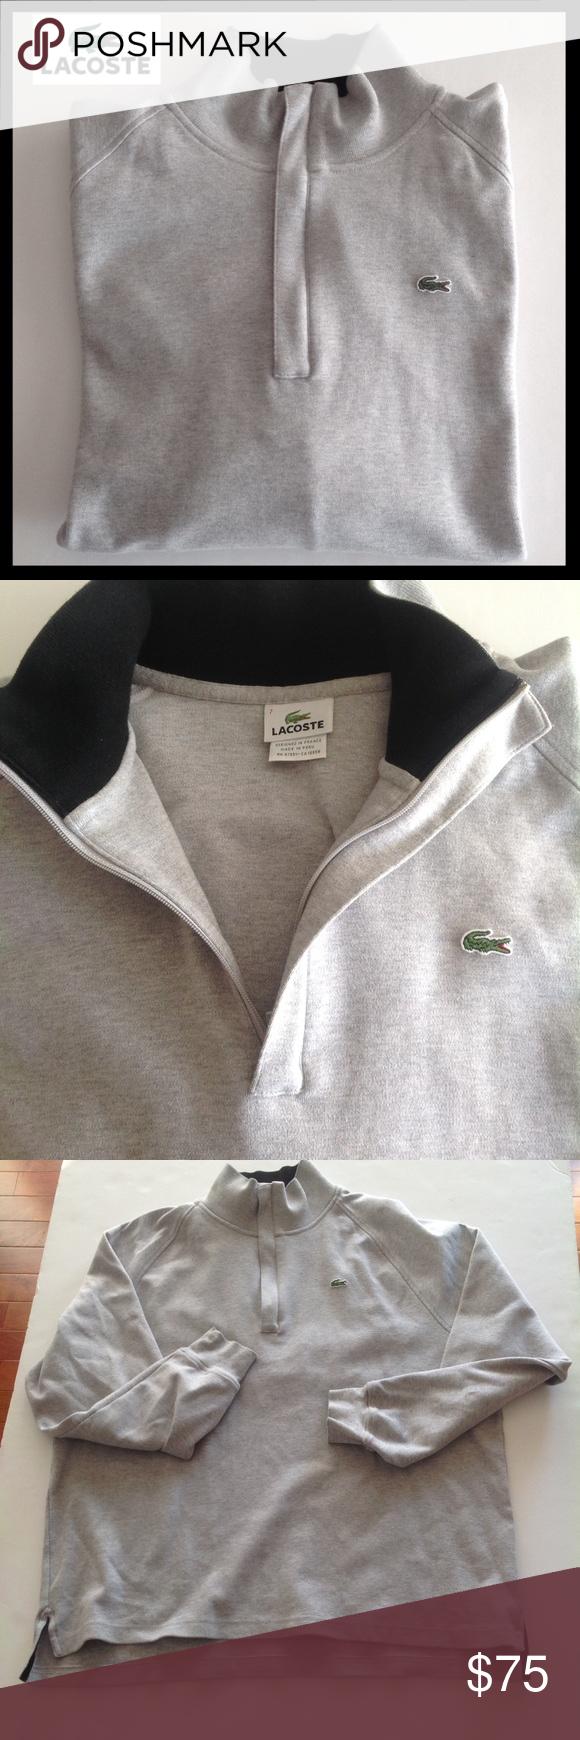 "LACOSTE Half Zip Pullover LACOSTE Half Zip Pullover. Lacoste size ""7"" is size XL. See size chart in last photo. Excellent Condition. Lacoste Shirts Sweatshirts & Hoodies"